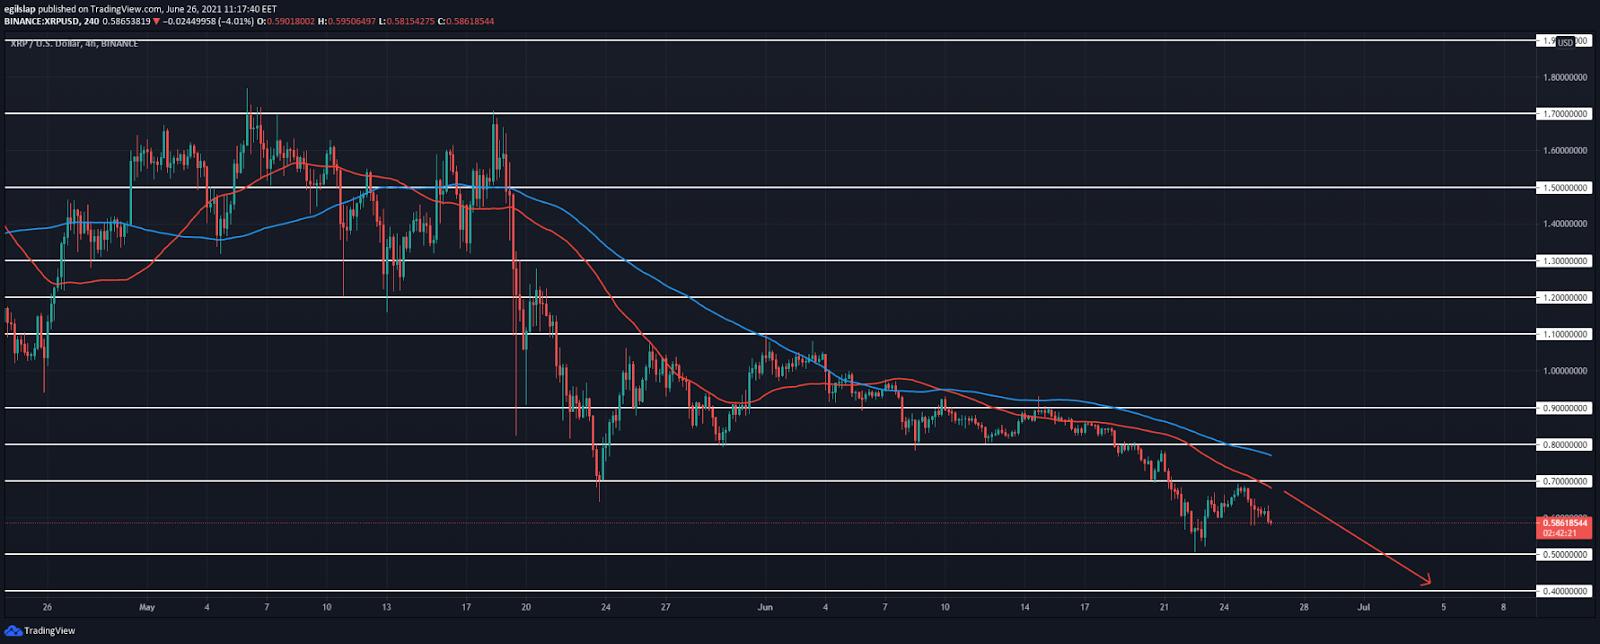 Ripple price analysis: Ripple slowly retraces to $0.70, starts to push below $0.50?